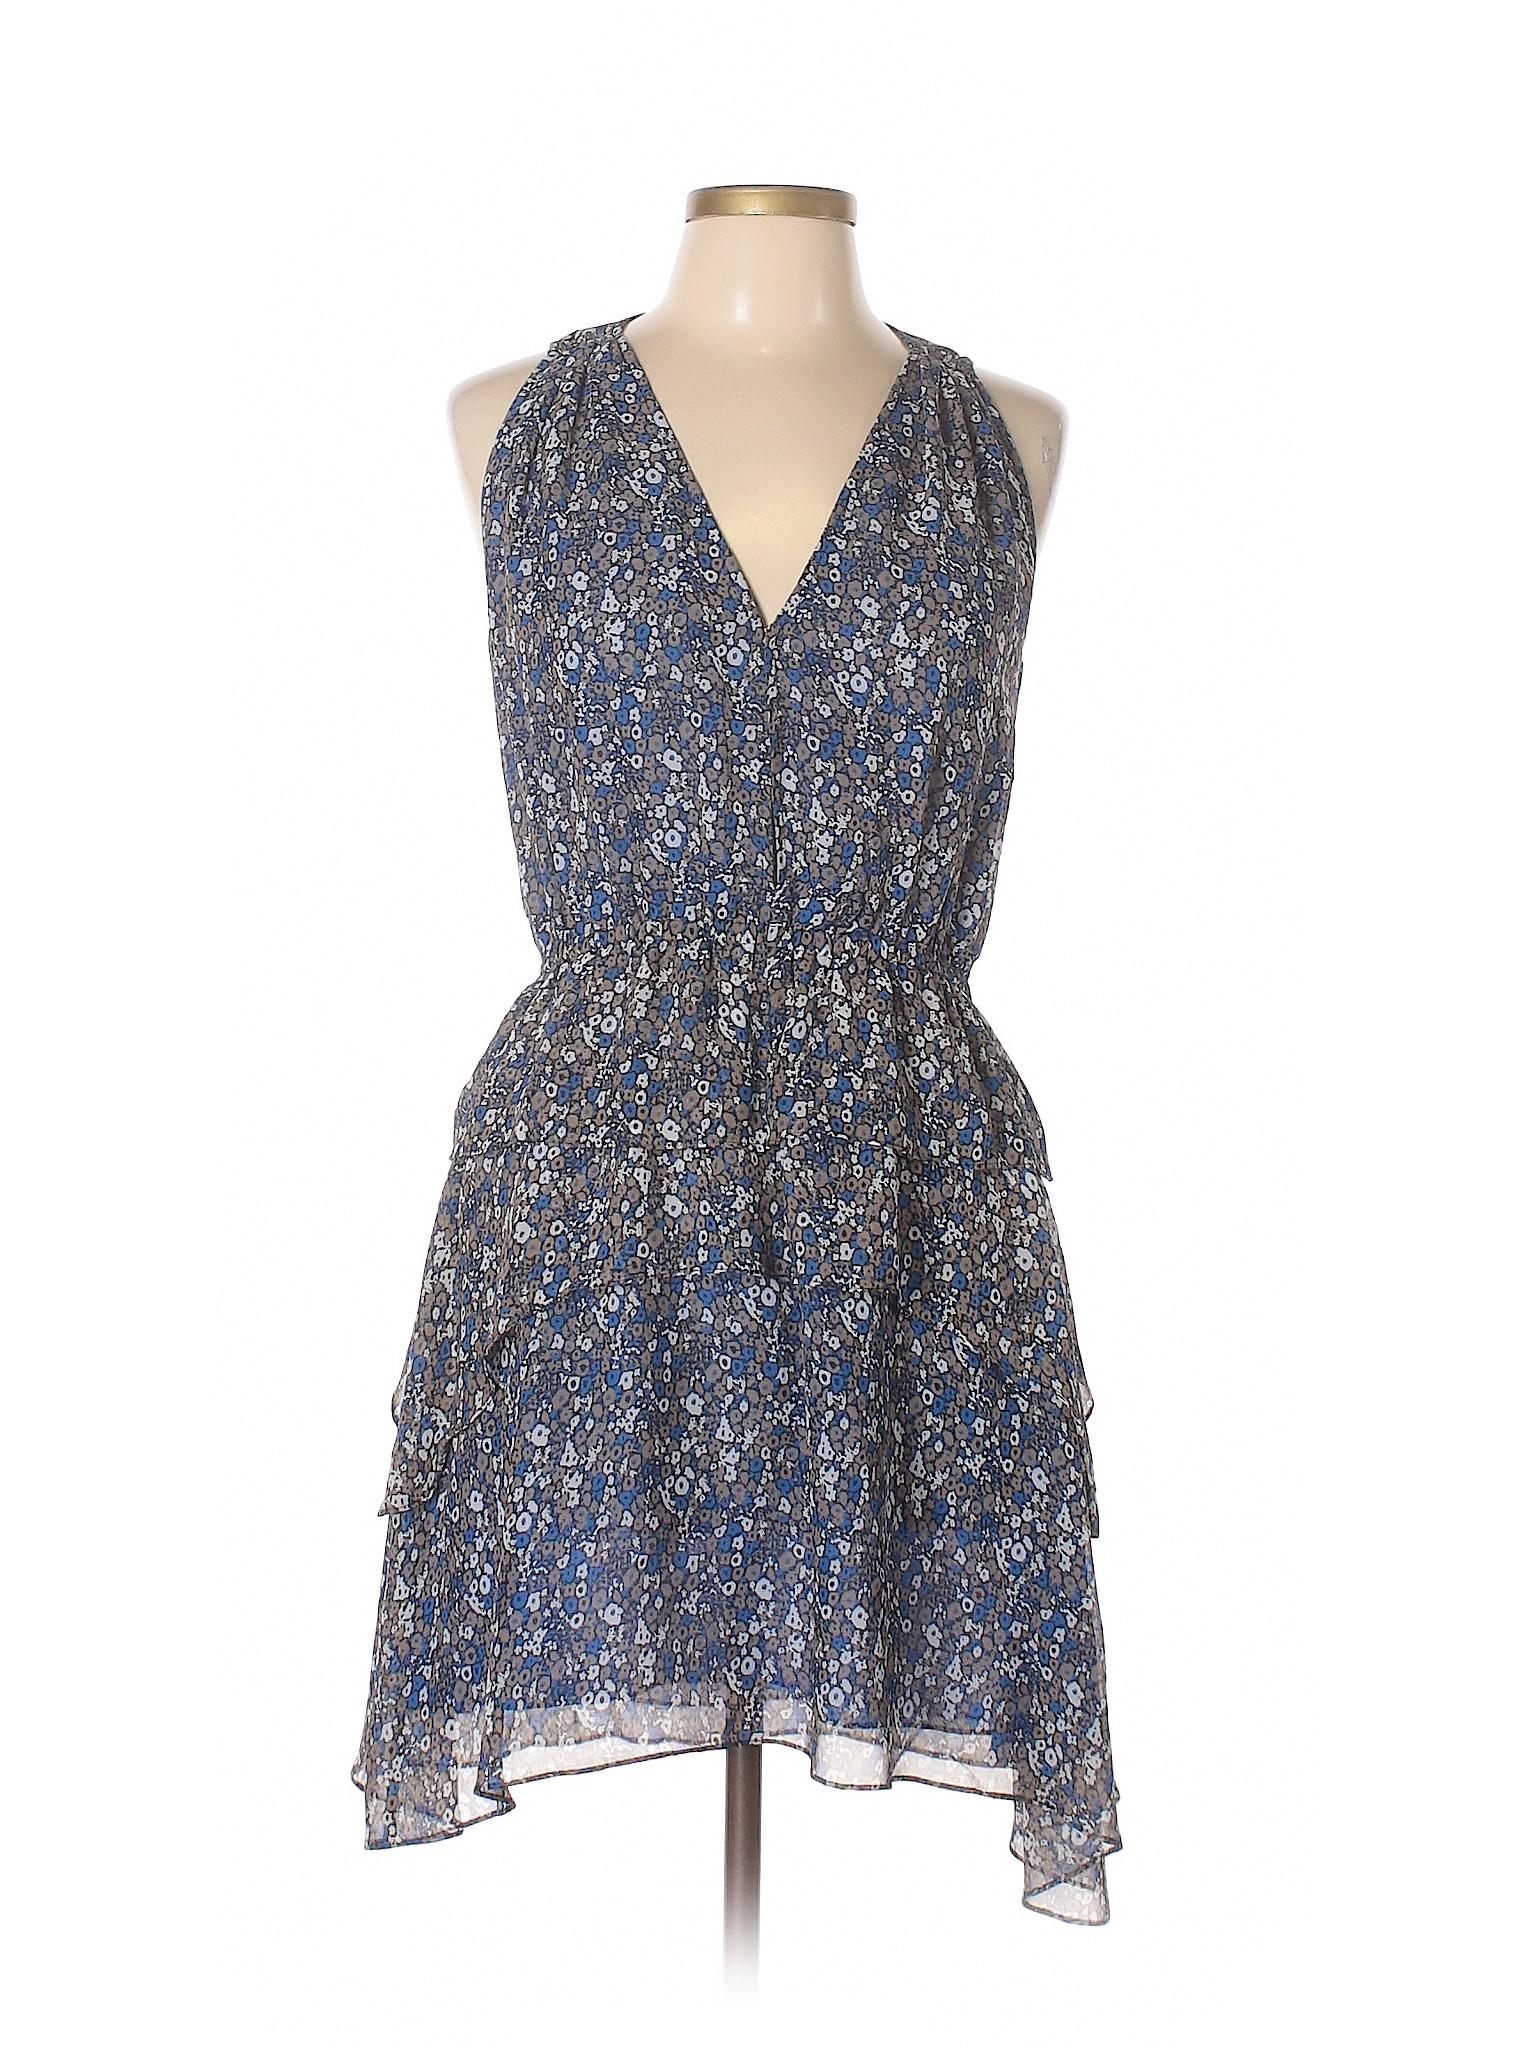 Boutique Casual Dress Derek Crosby winter Lam 10 rq6r47Z